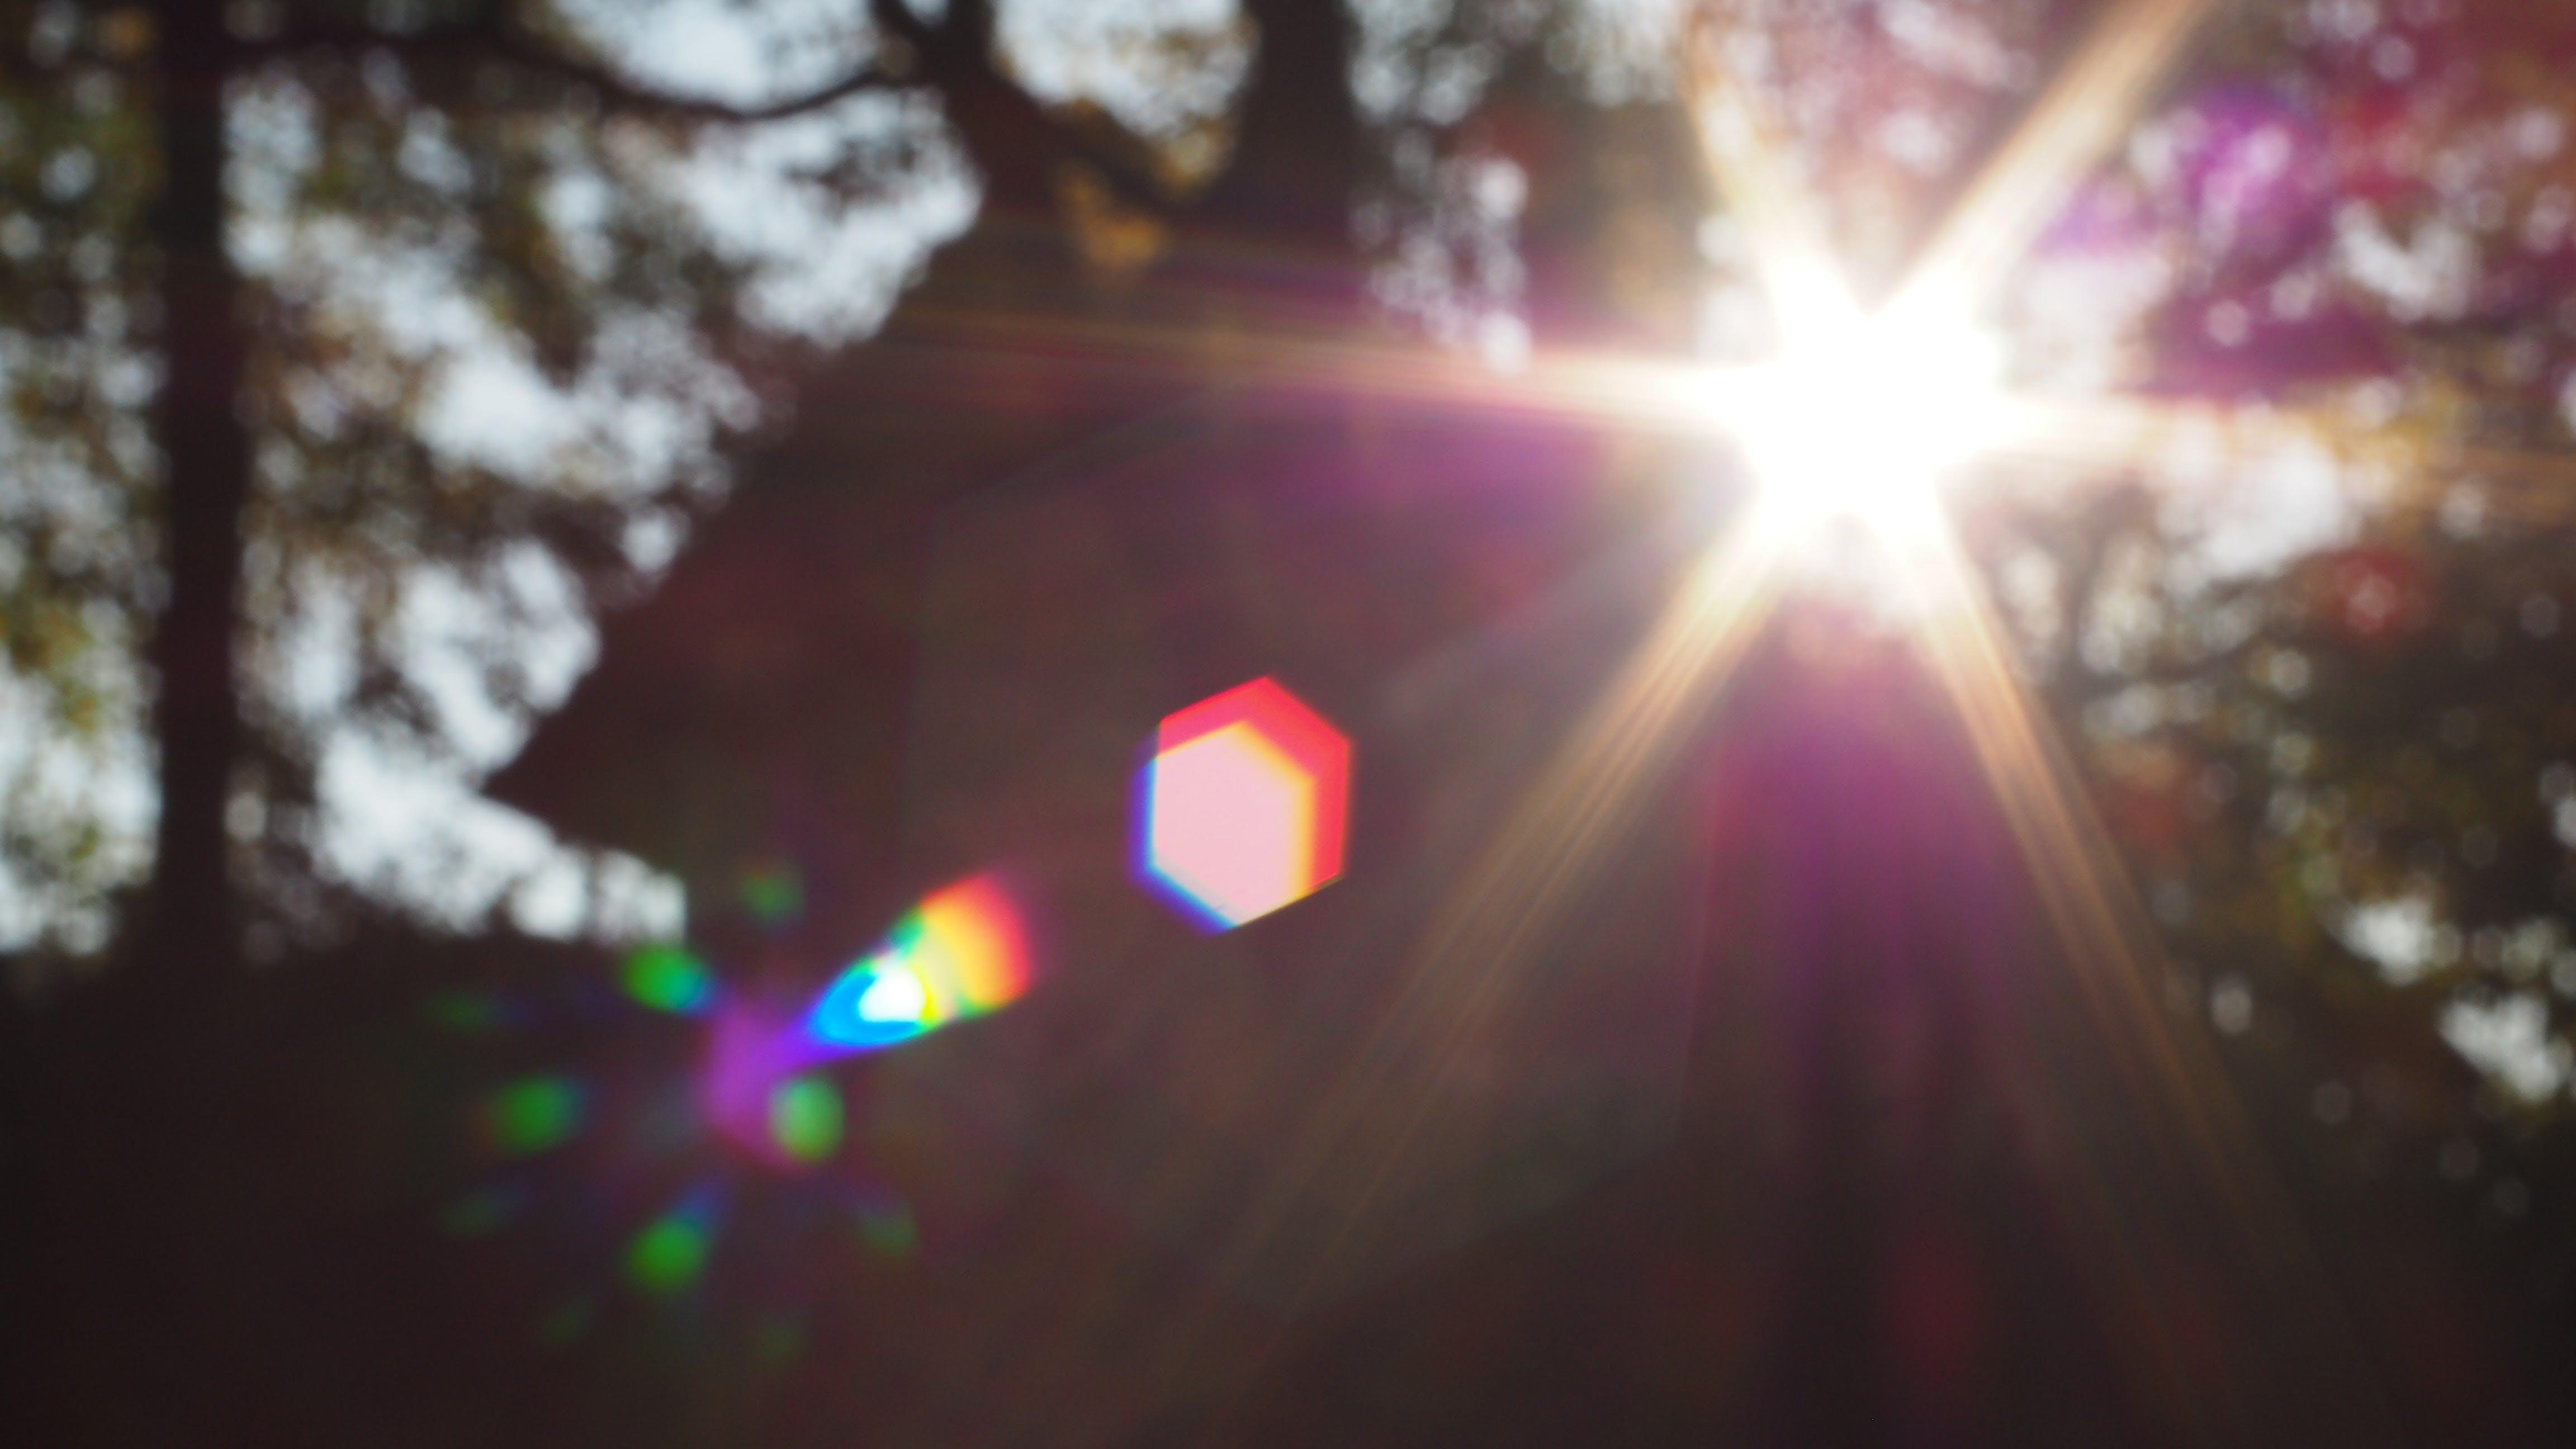 Free stock photo of flare, lens flare, solar flare